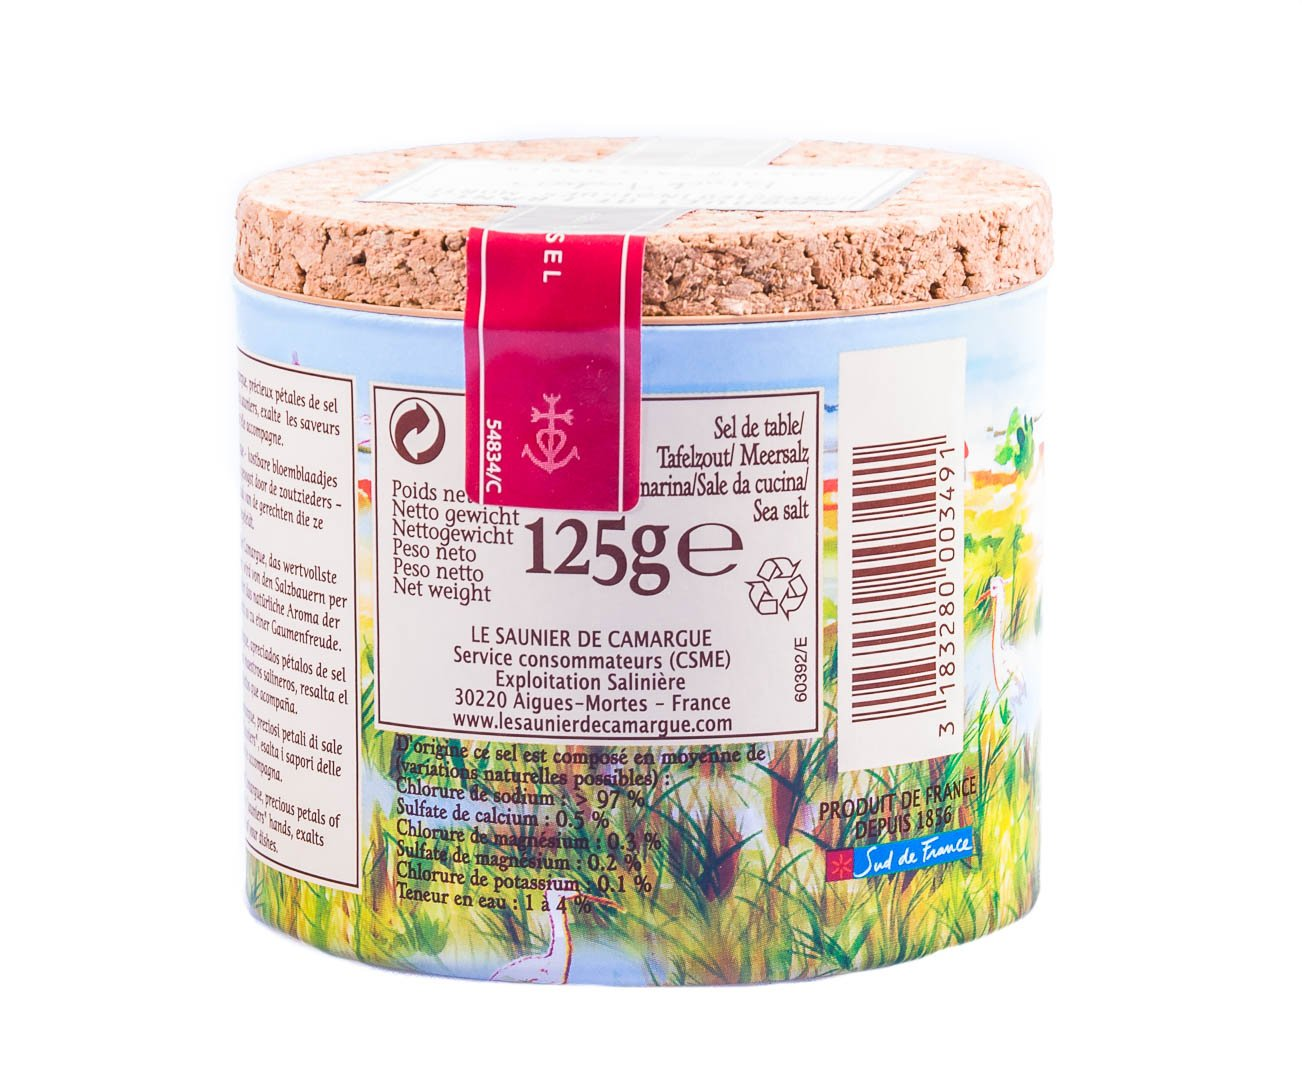 Le Saunier De Camargue Fleur De Sel From France 125 Grams Amazon